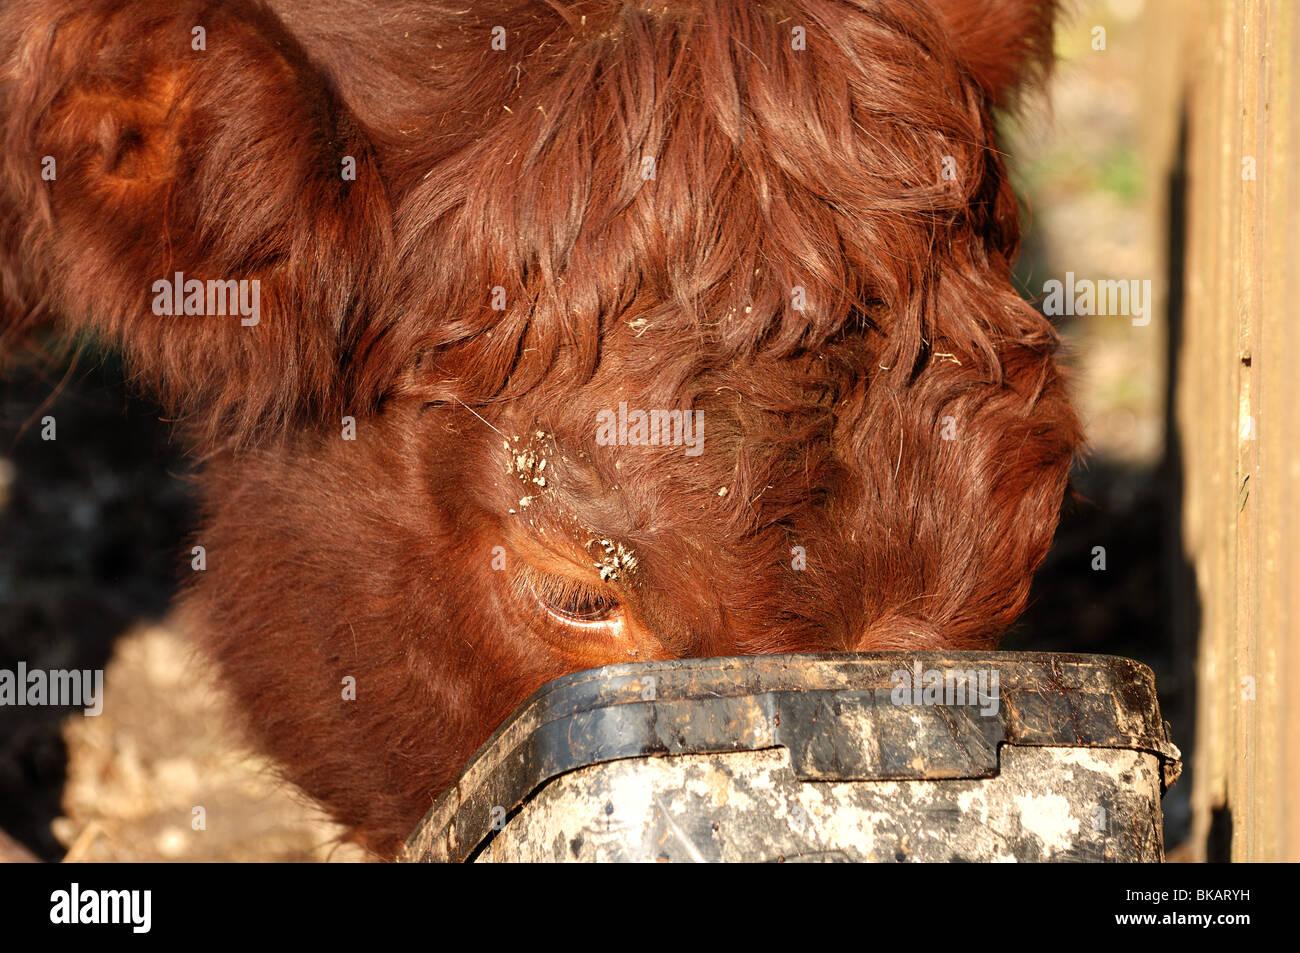 Woman lick cow-7690